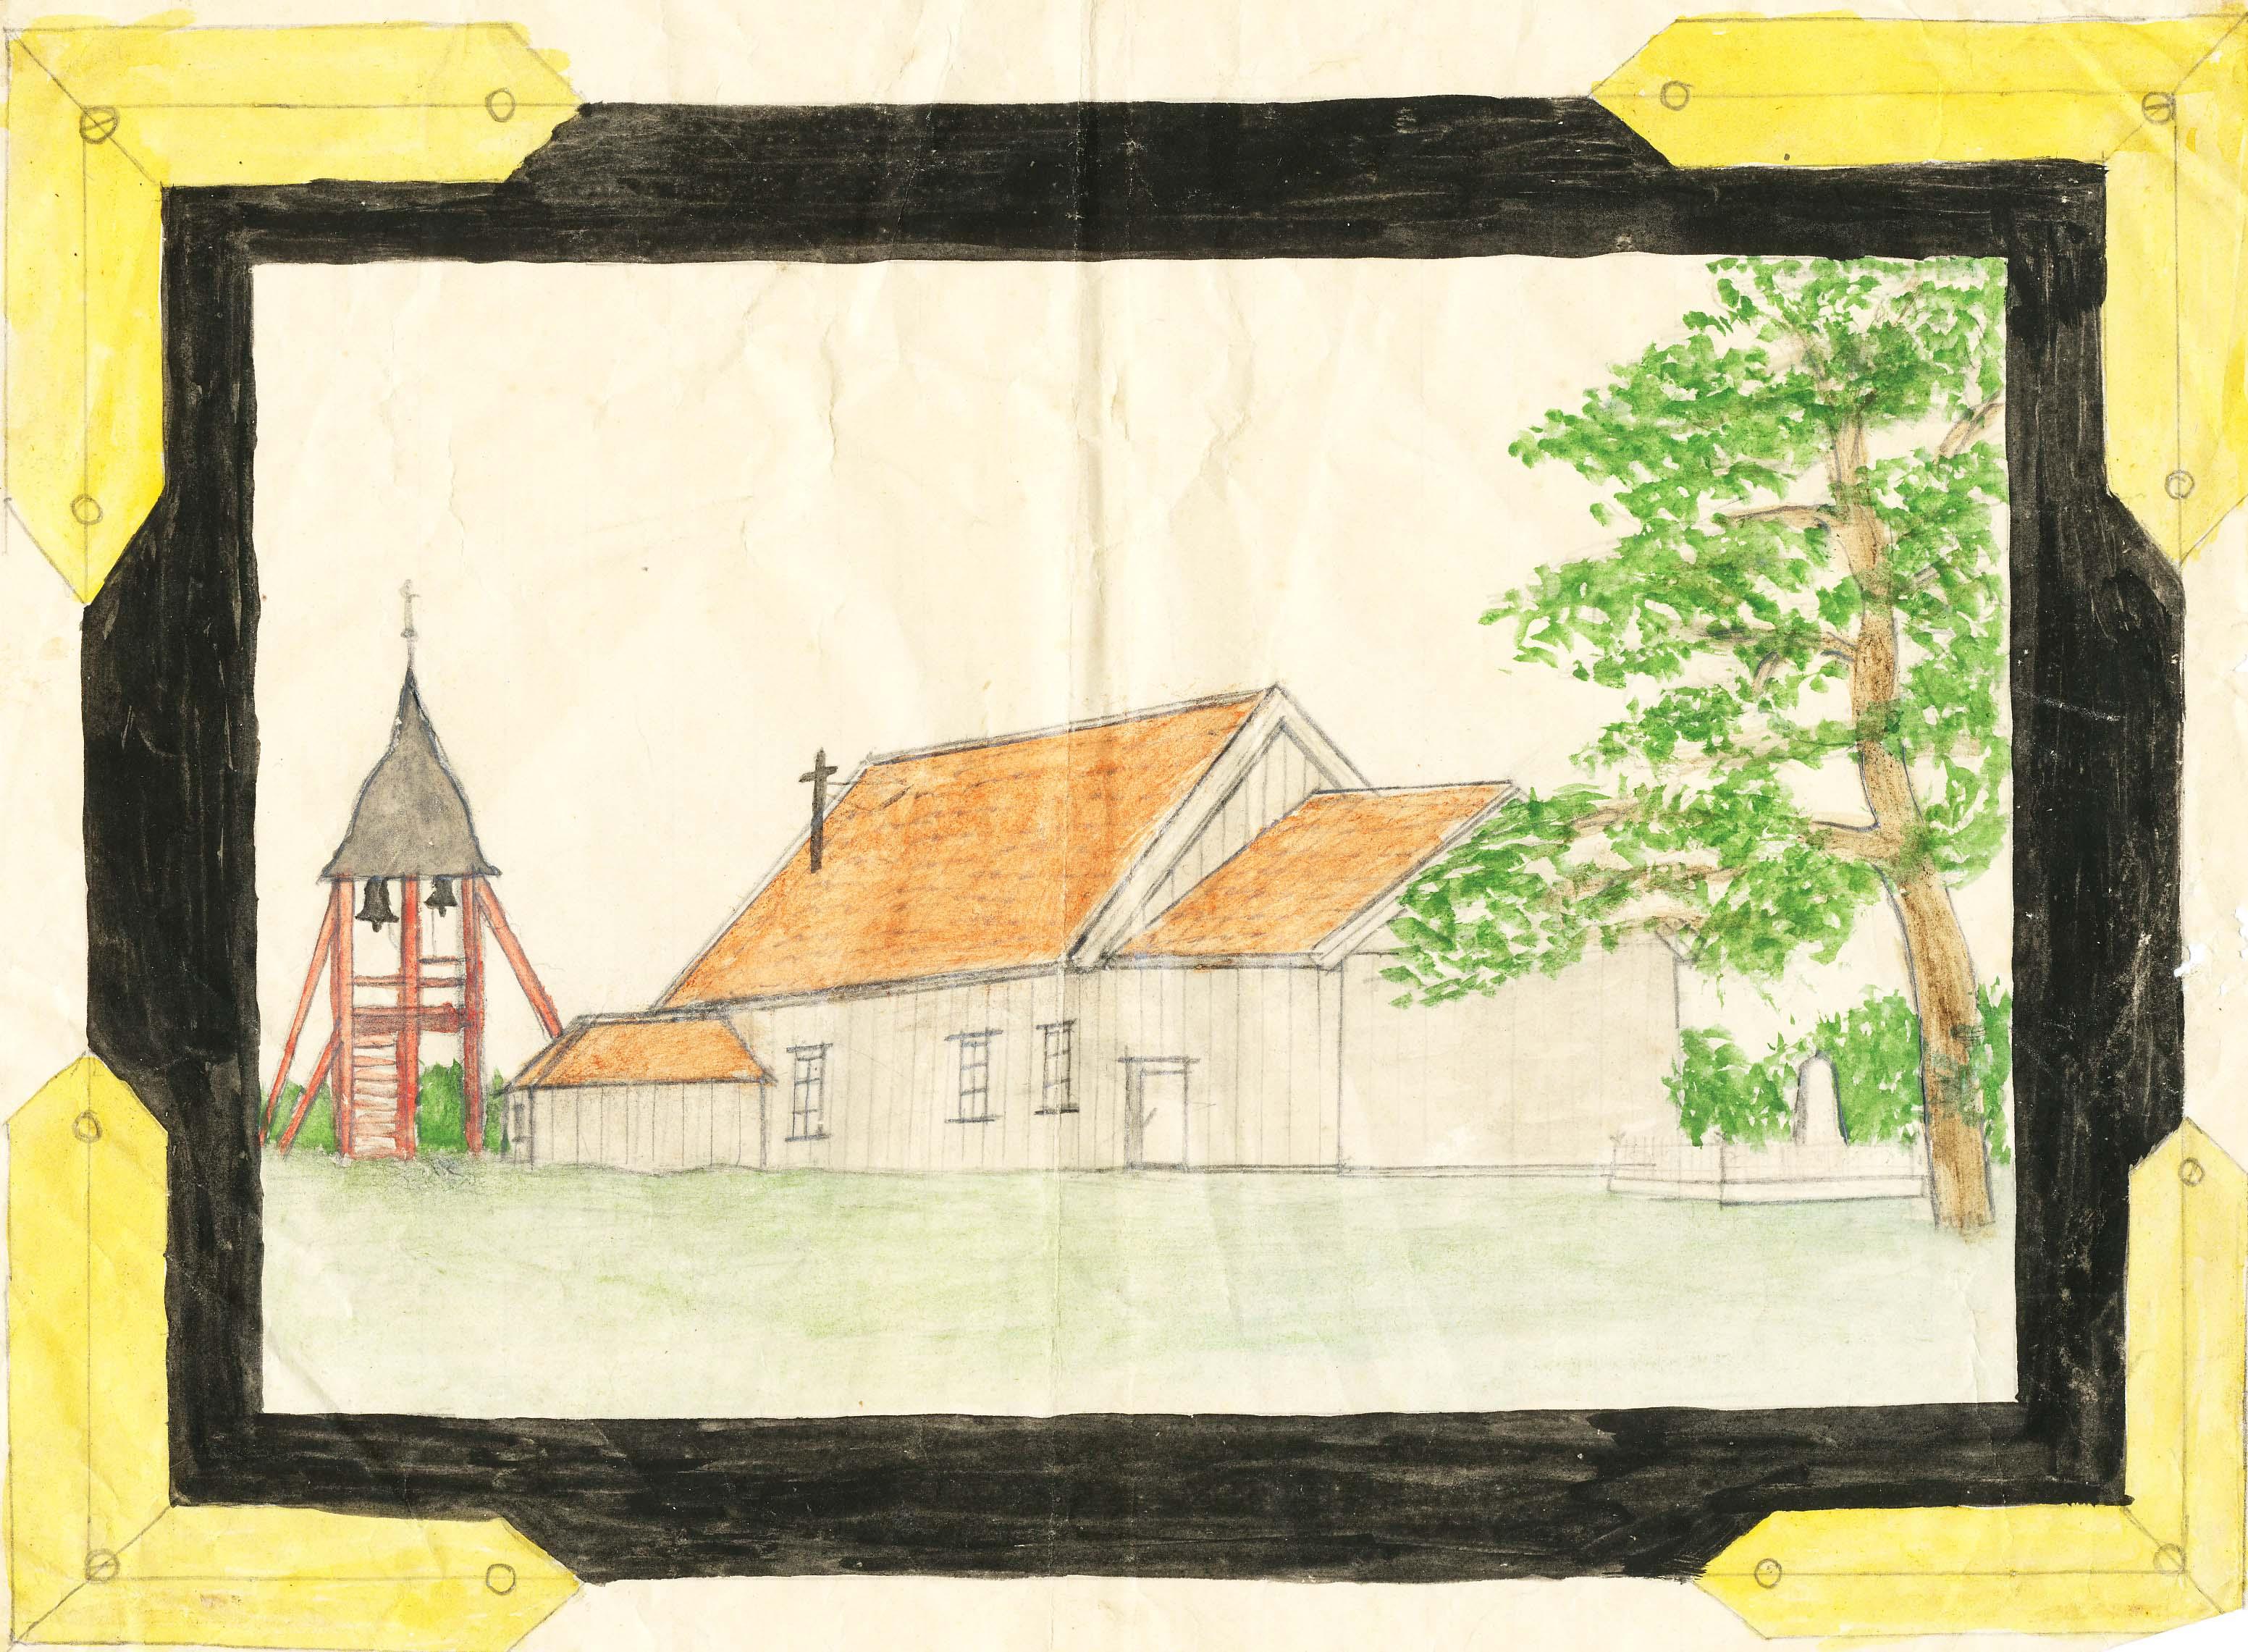 Longs gamla kyrka